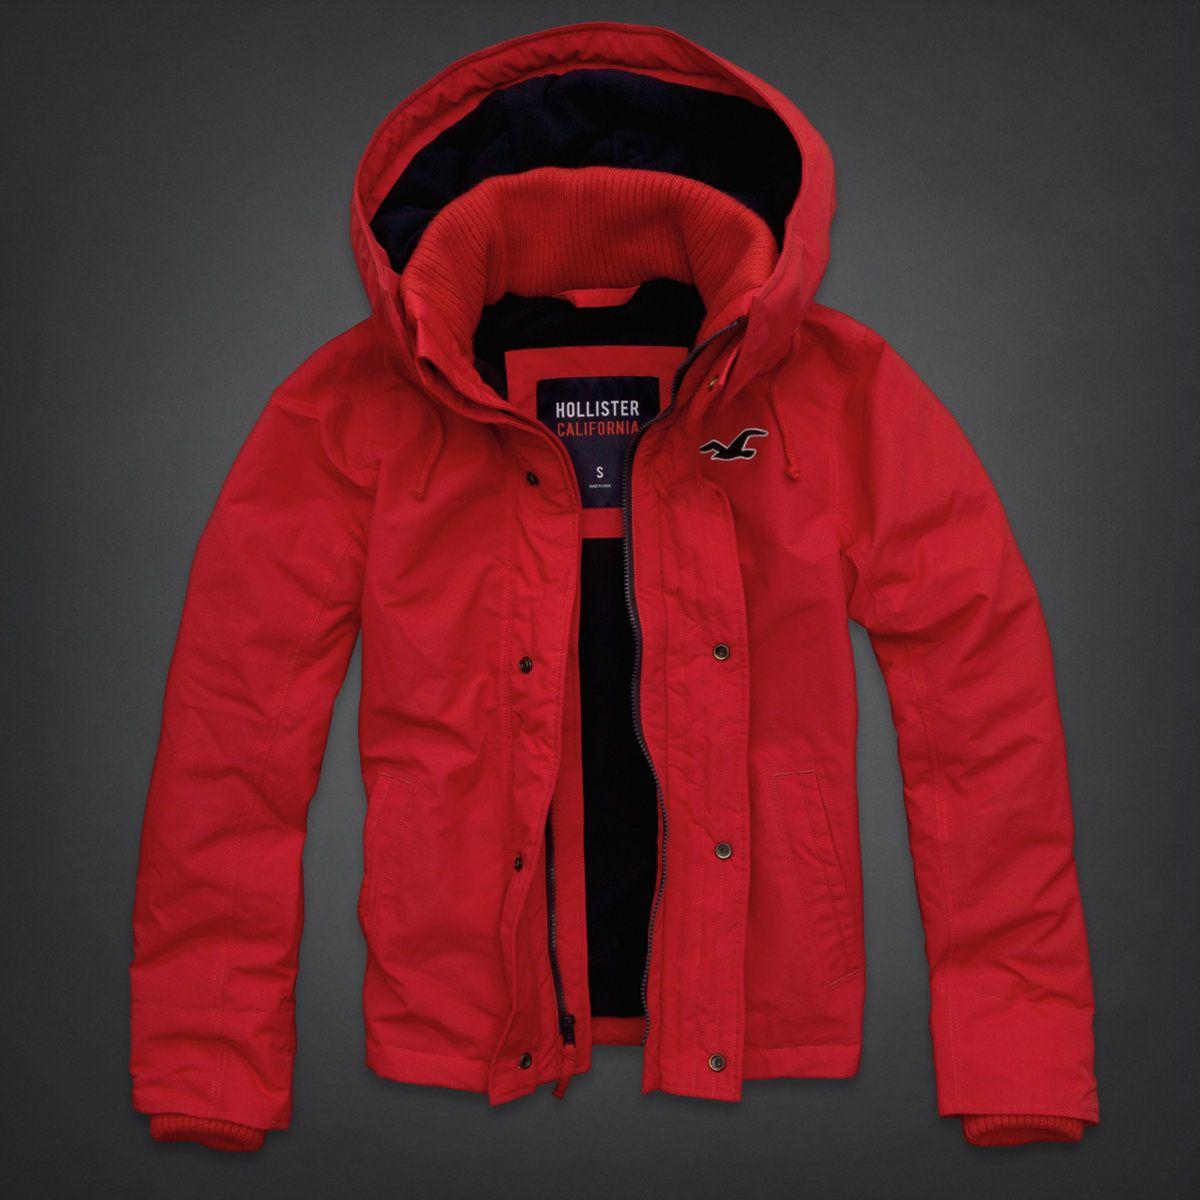 hollister jackets mens